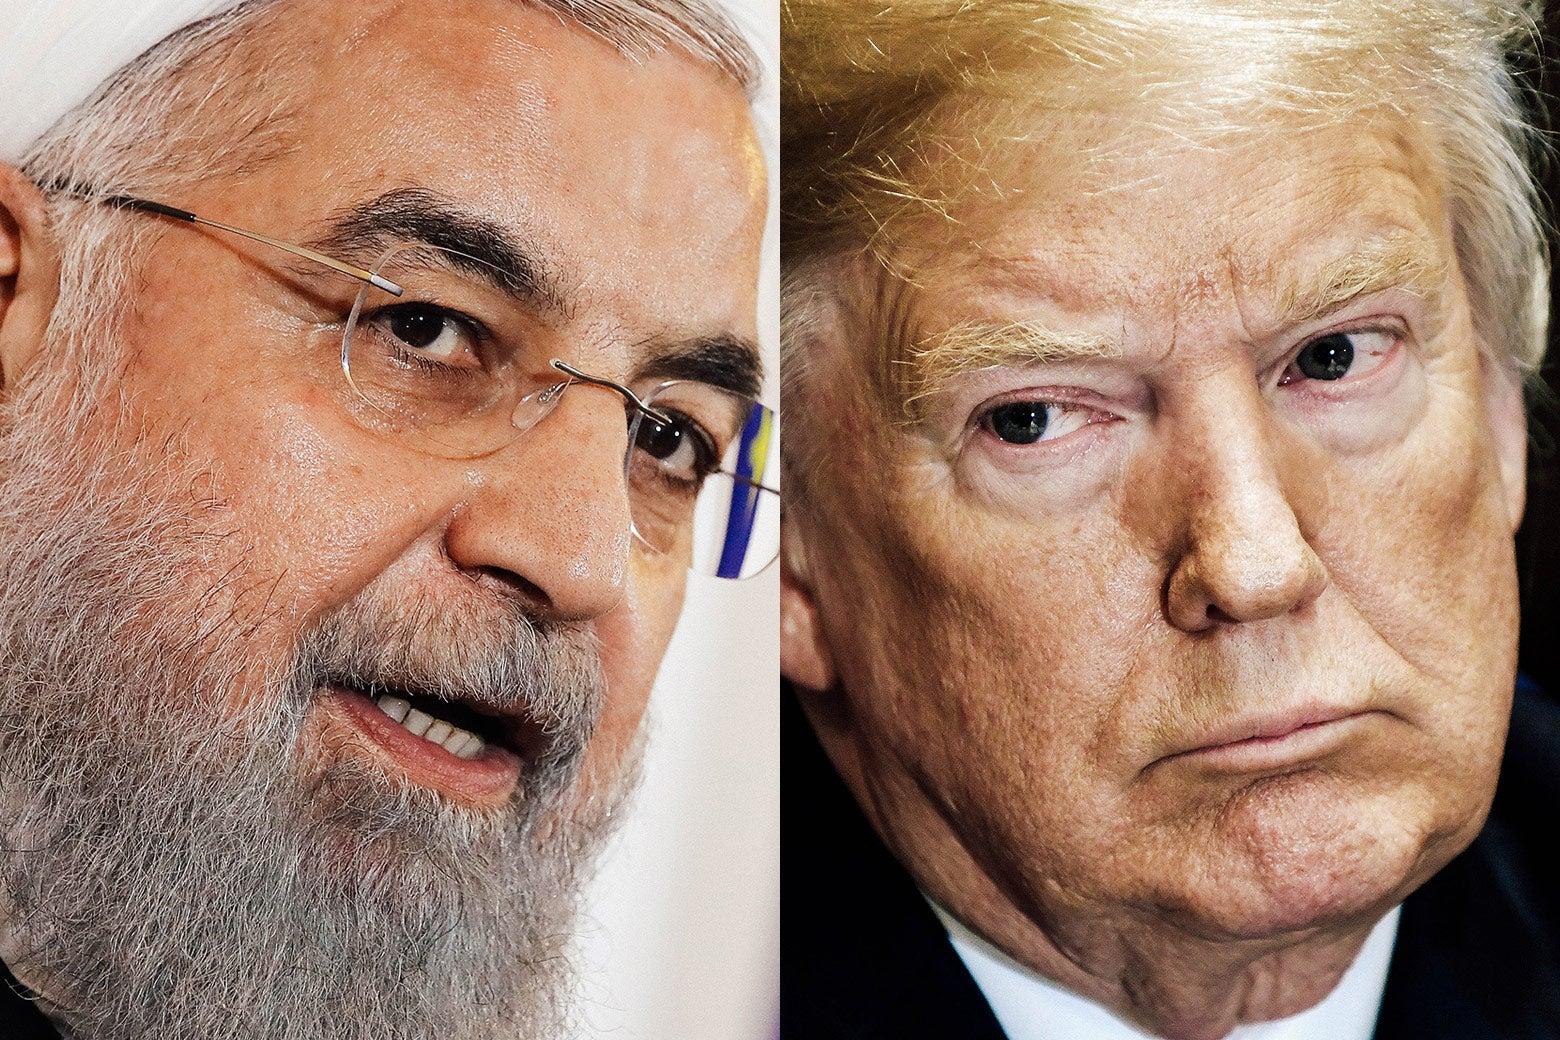 Iranian President Hassan Rouhani and U.S. President Donald Trump.